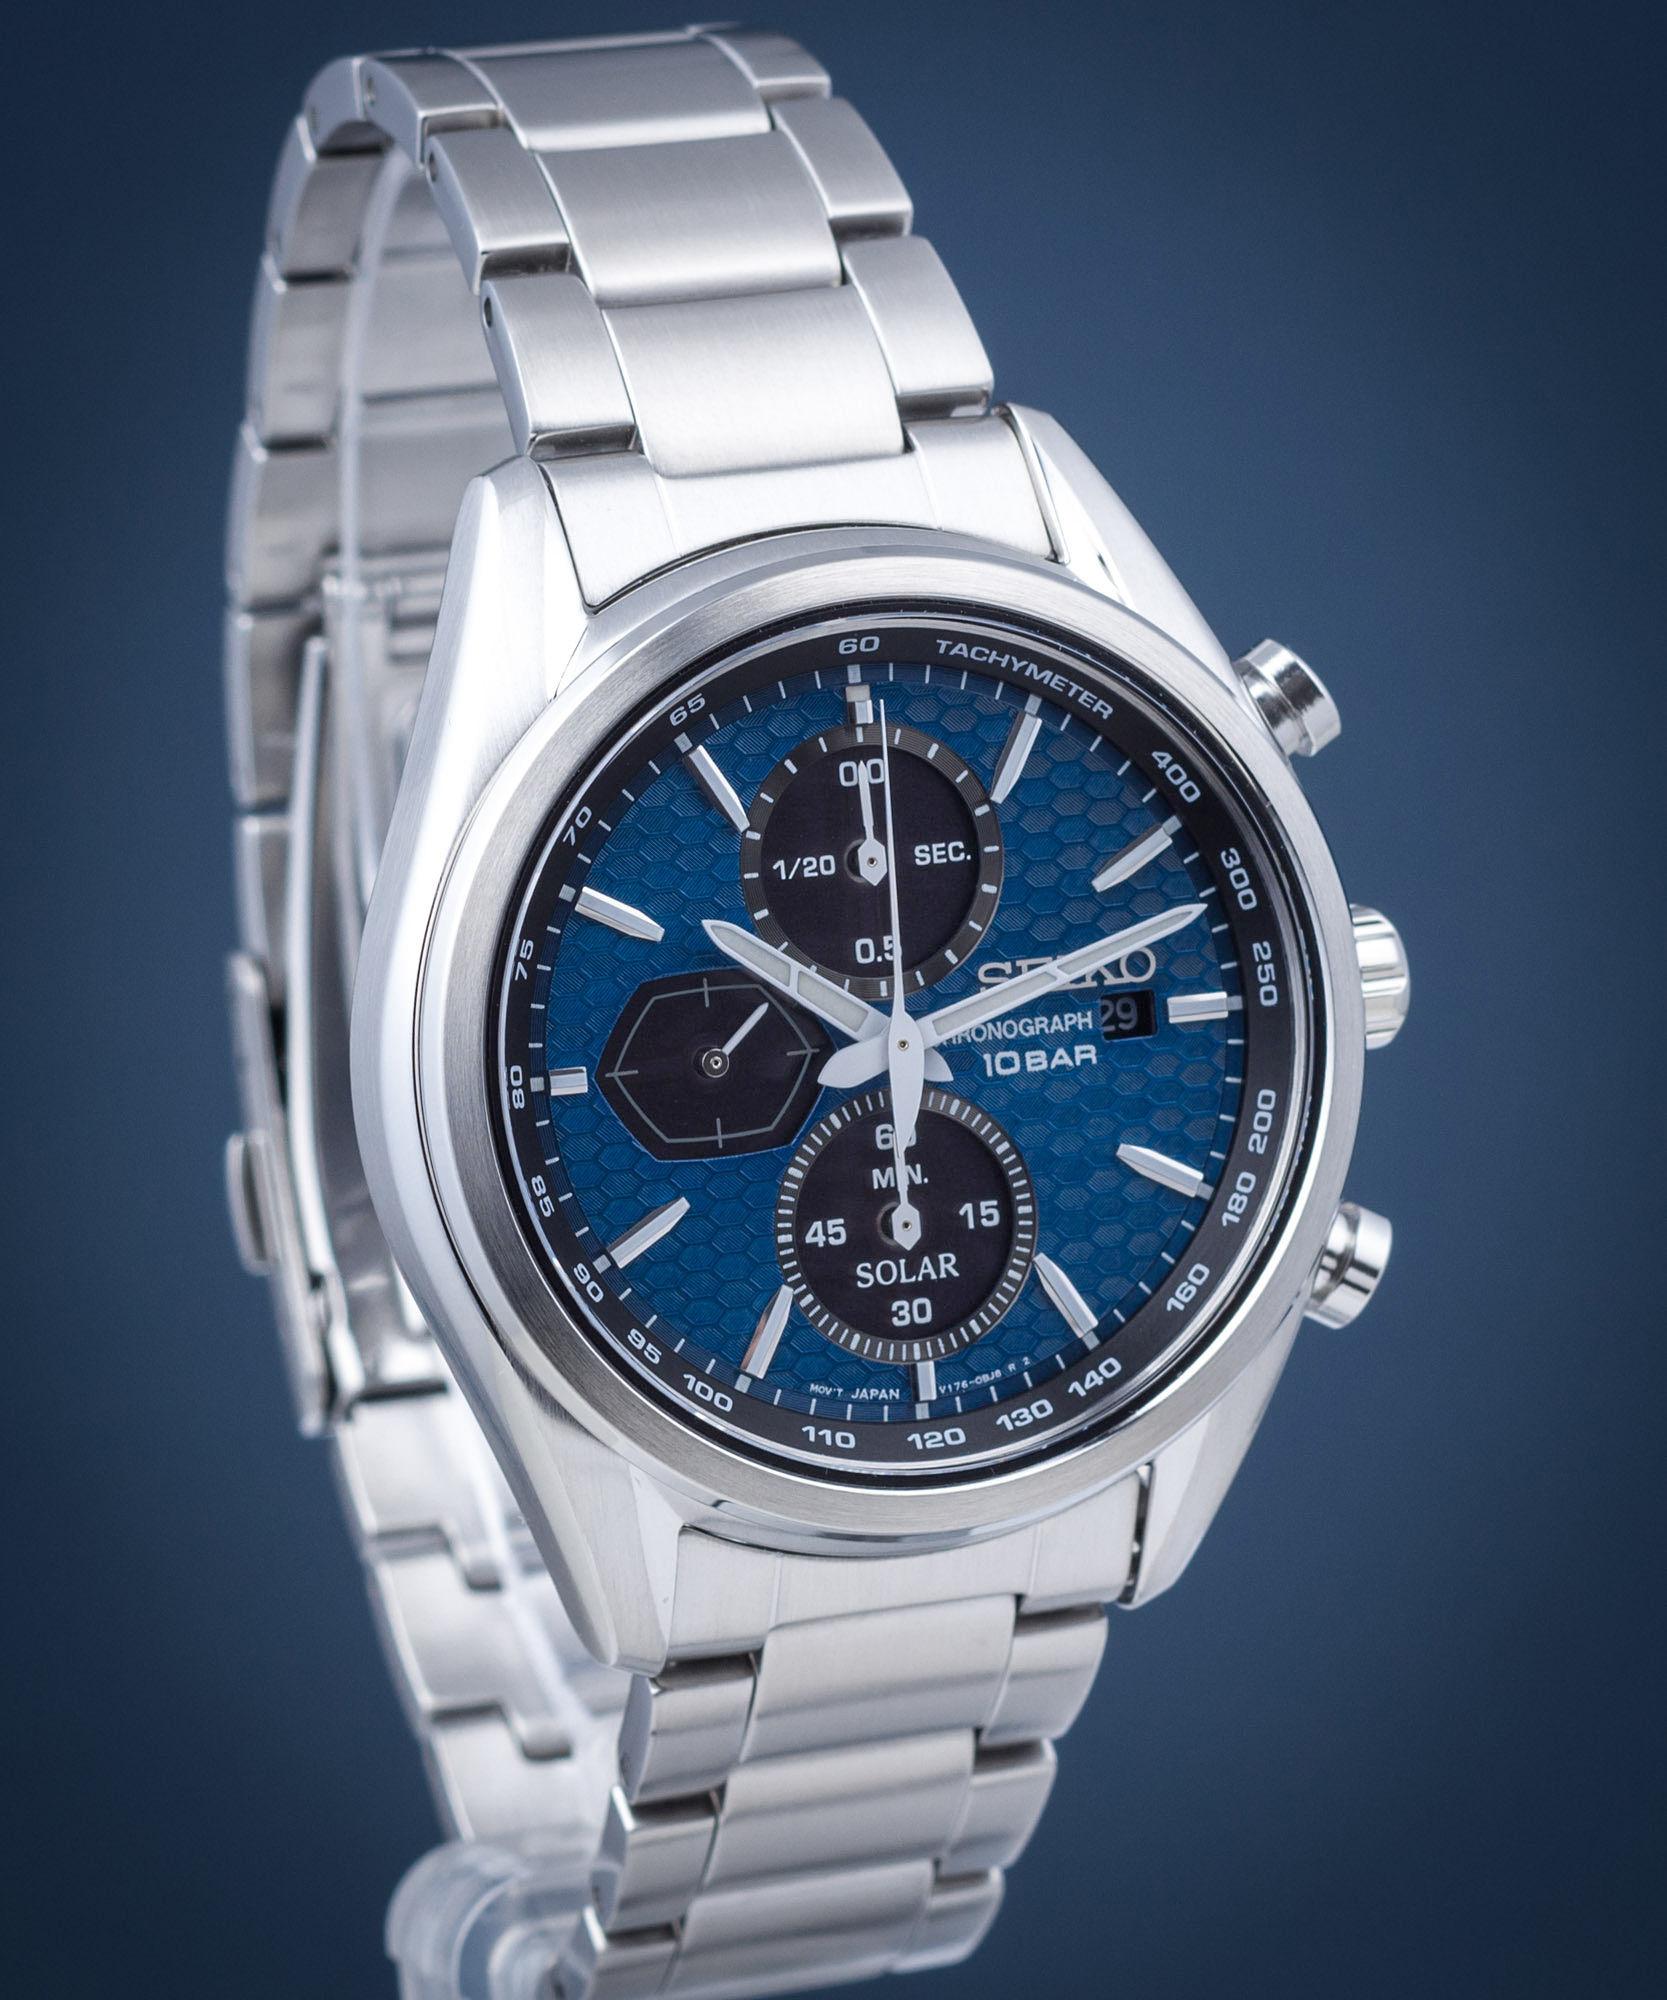 Zegarek męski Seiko Solar Chronograph